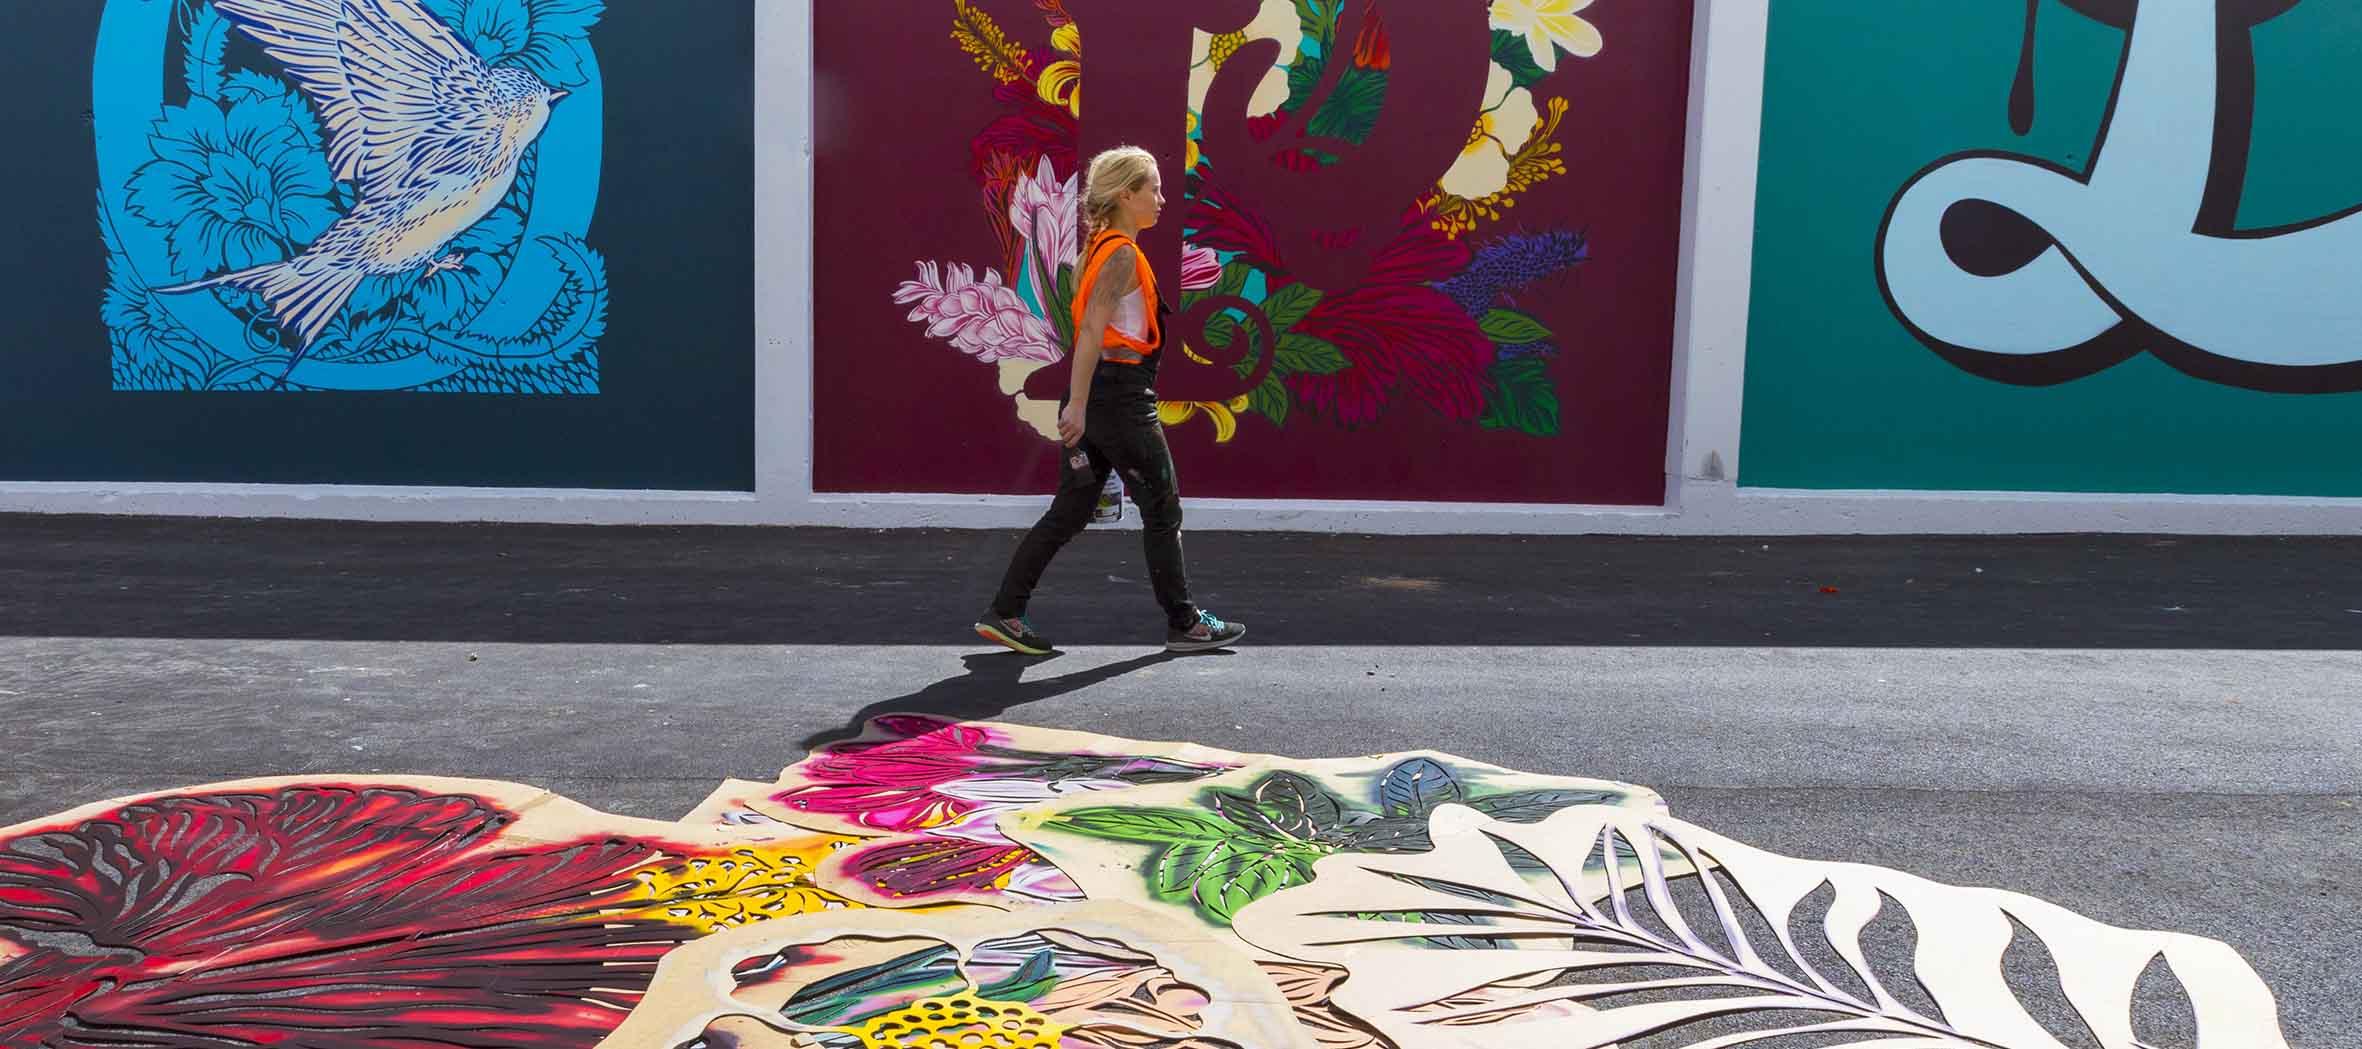 An artist walks in front of her work in progress.